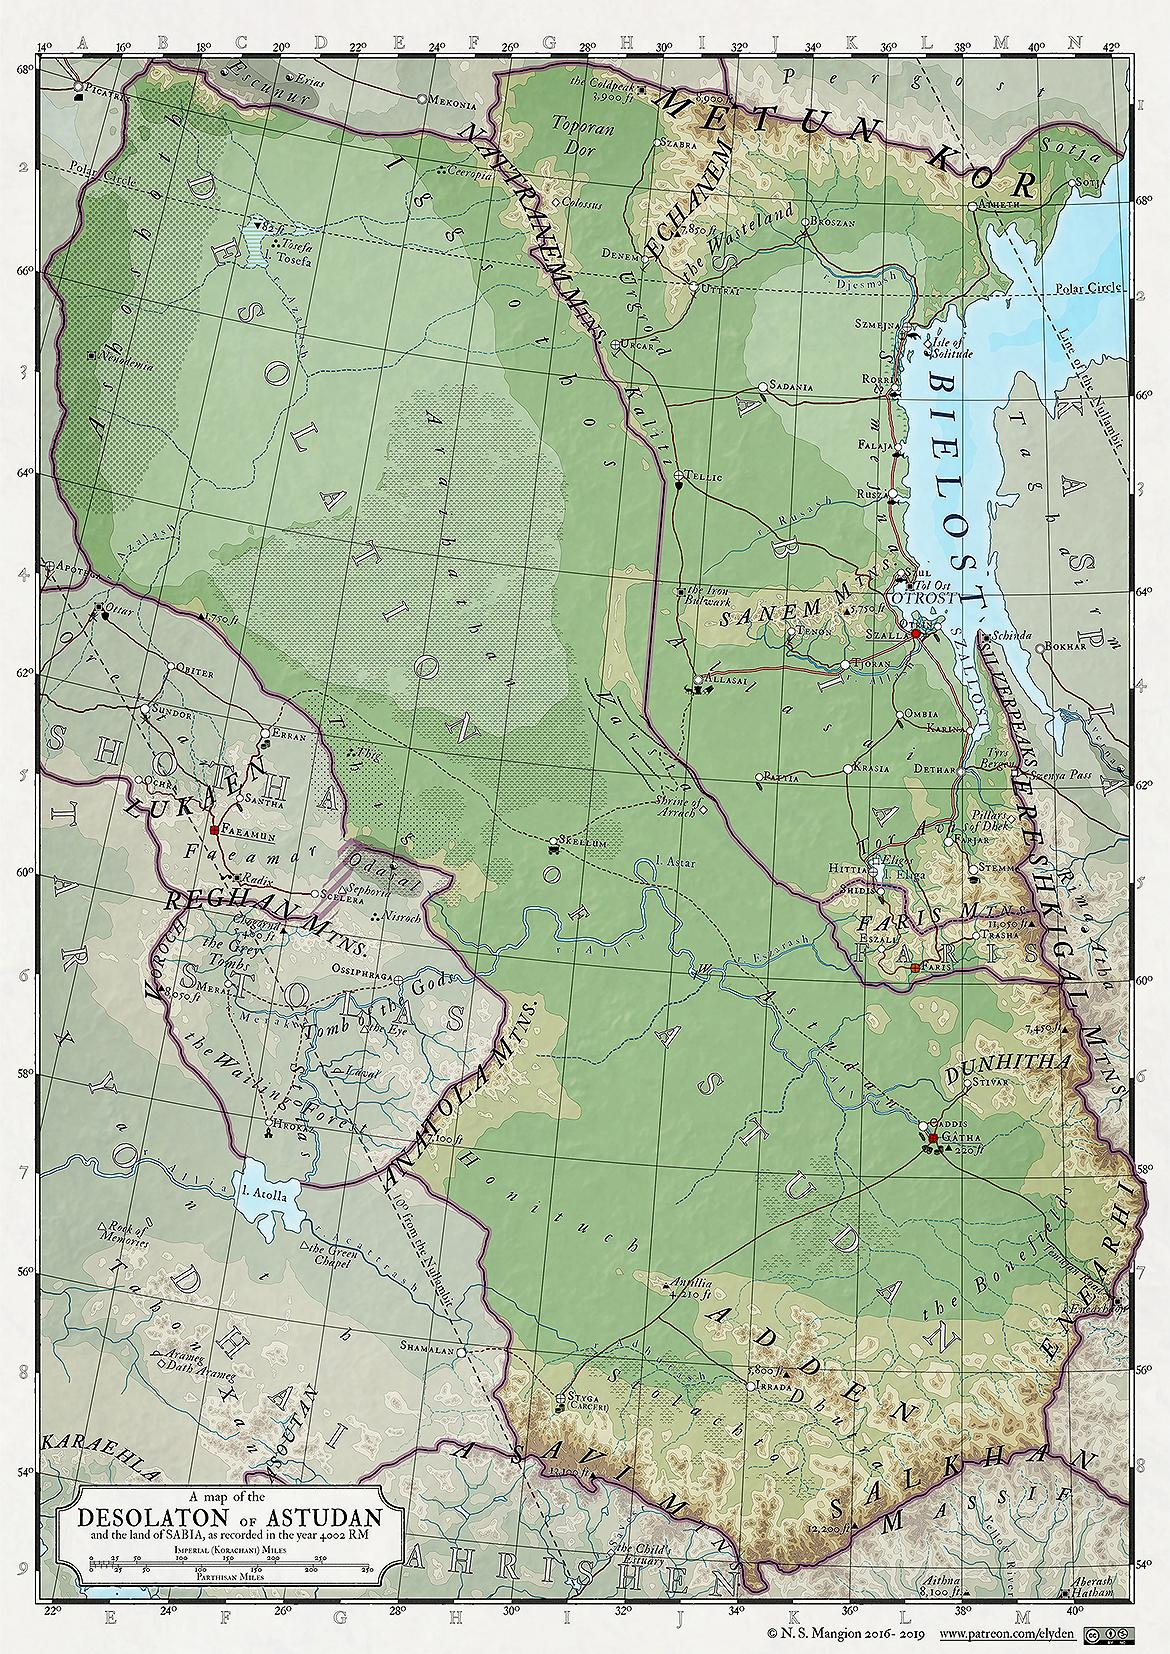 13 - the Desolation of Astudan